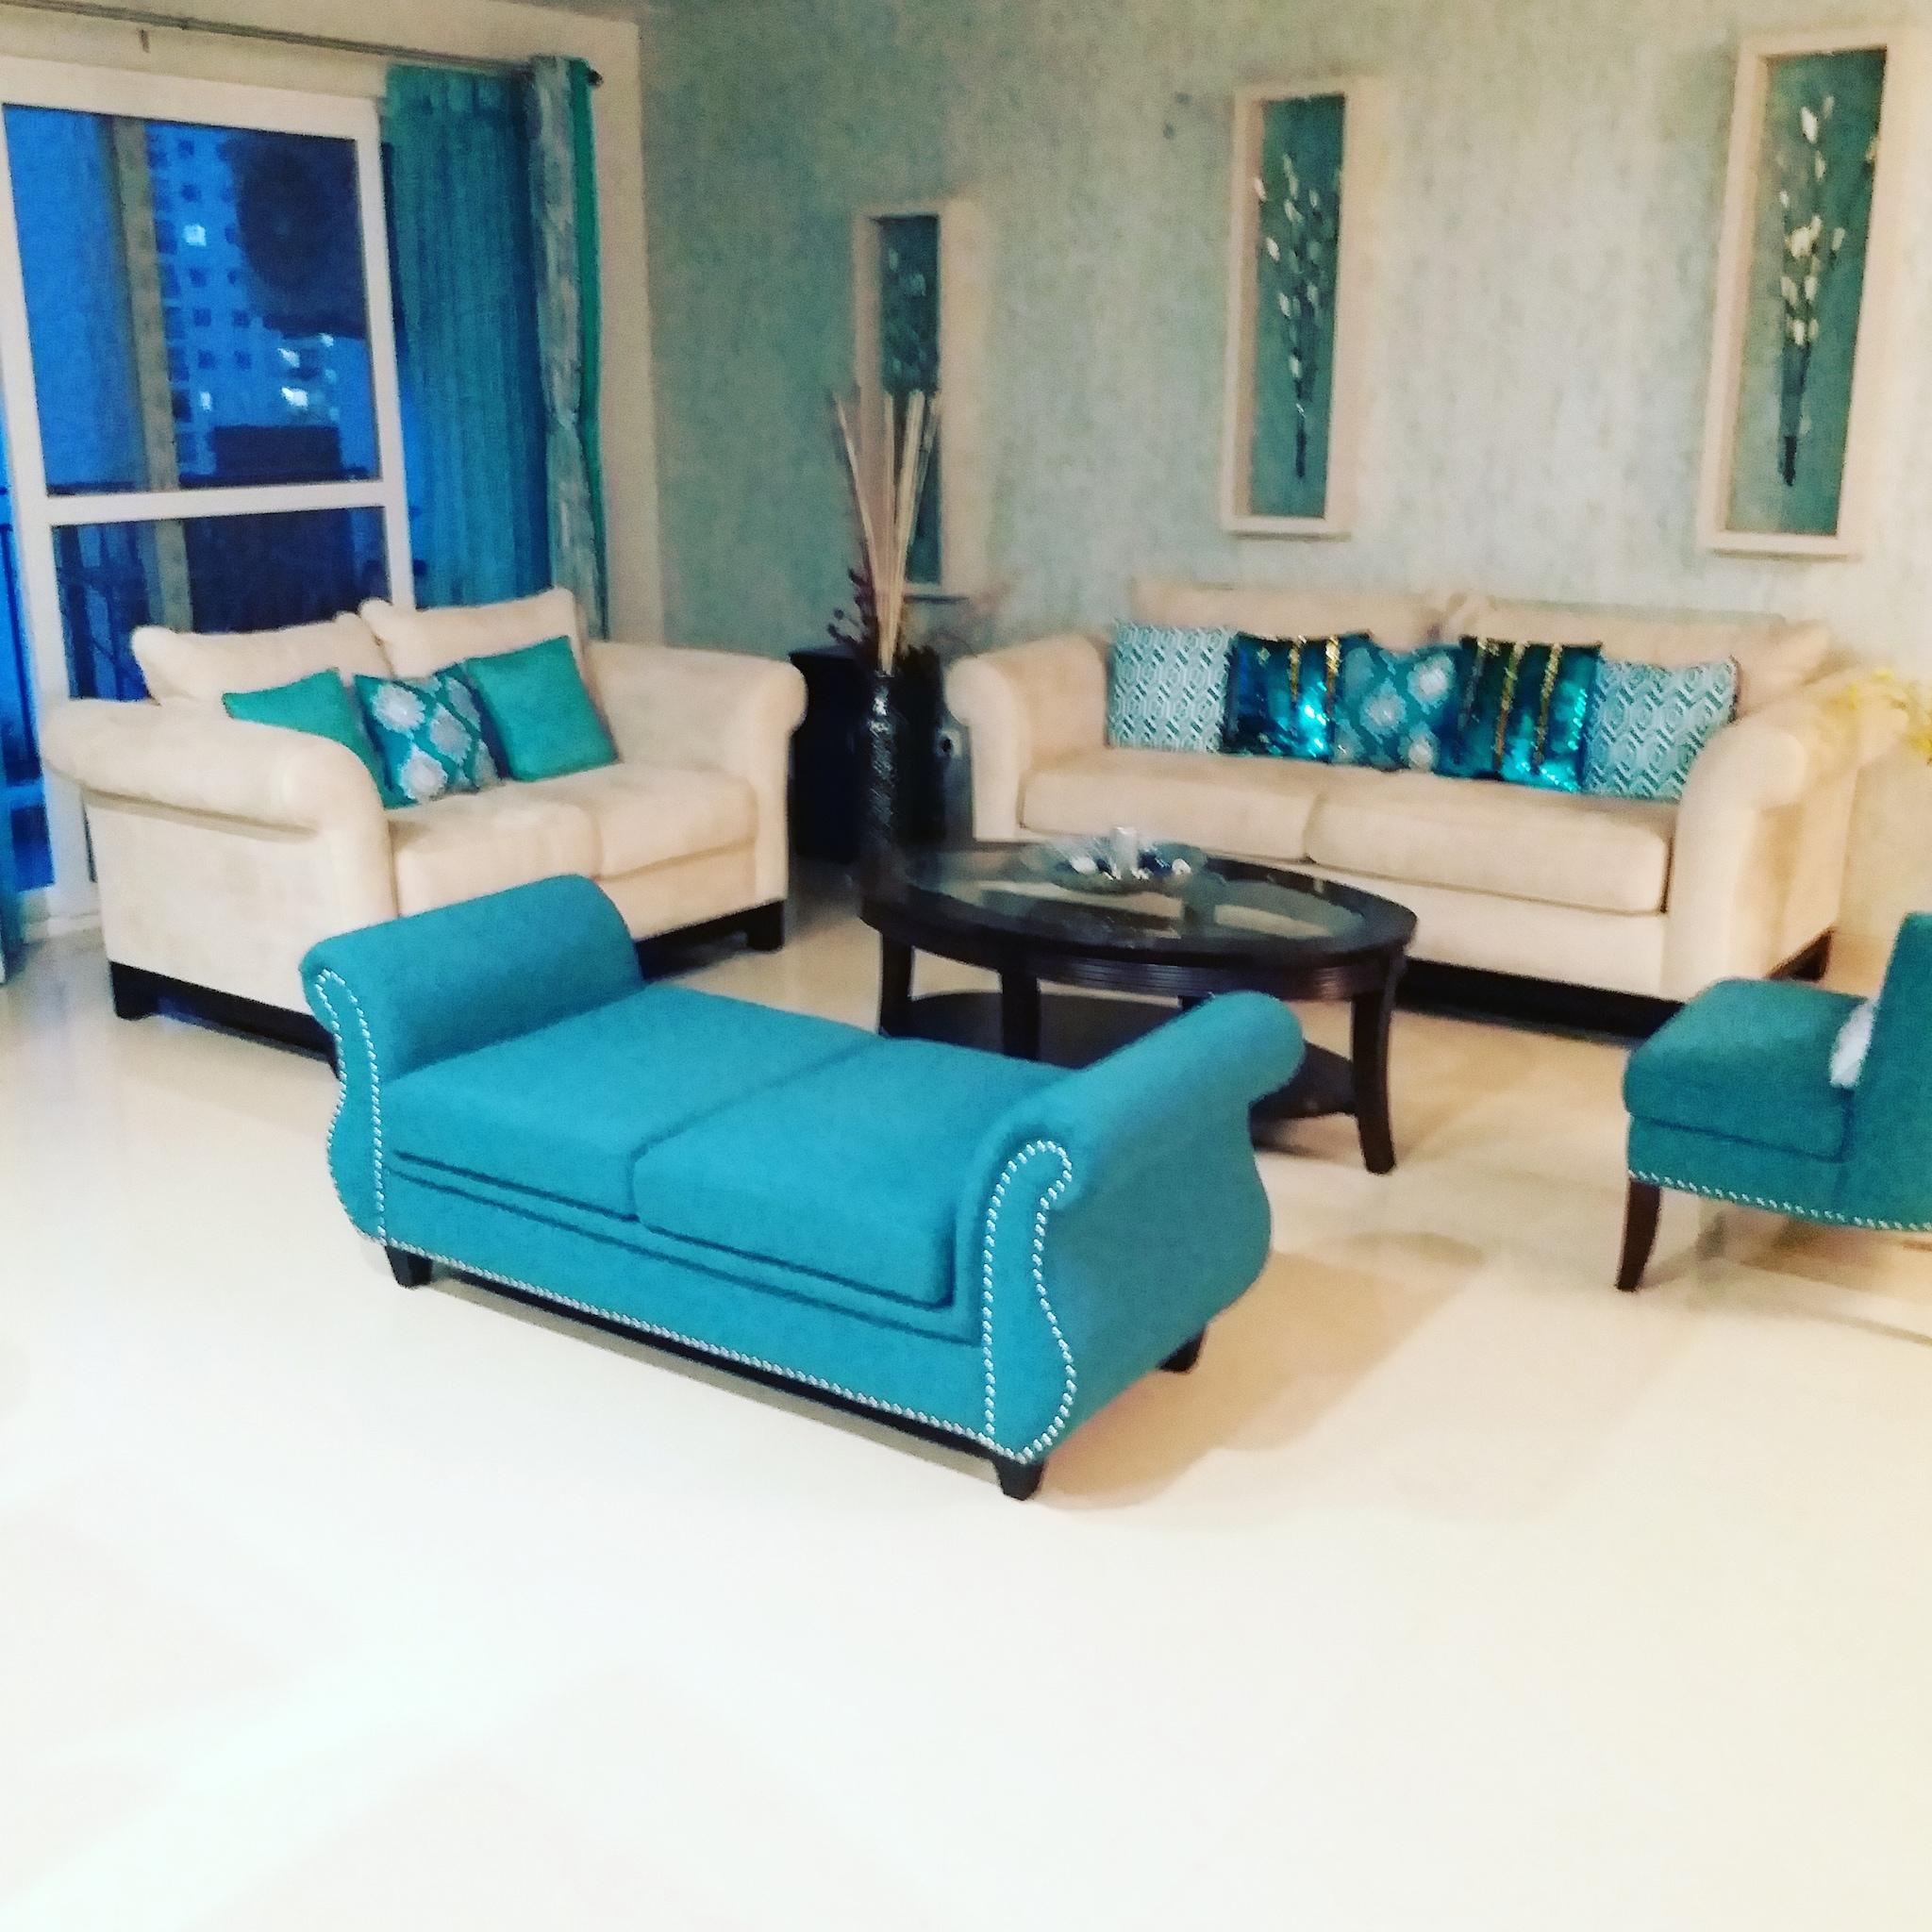 Nmz Upholstery Works Bellandur Sofa